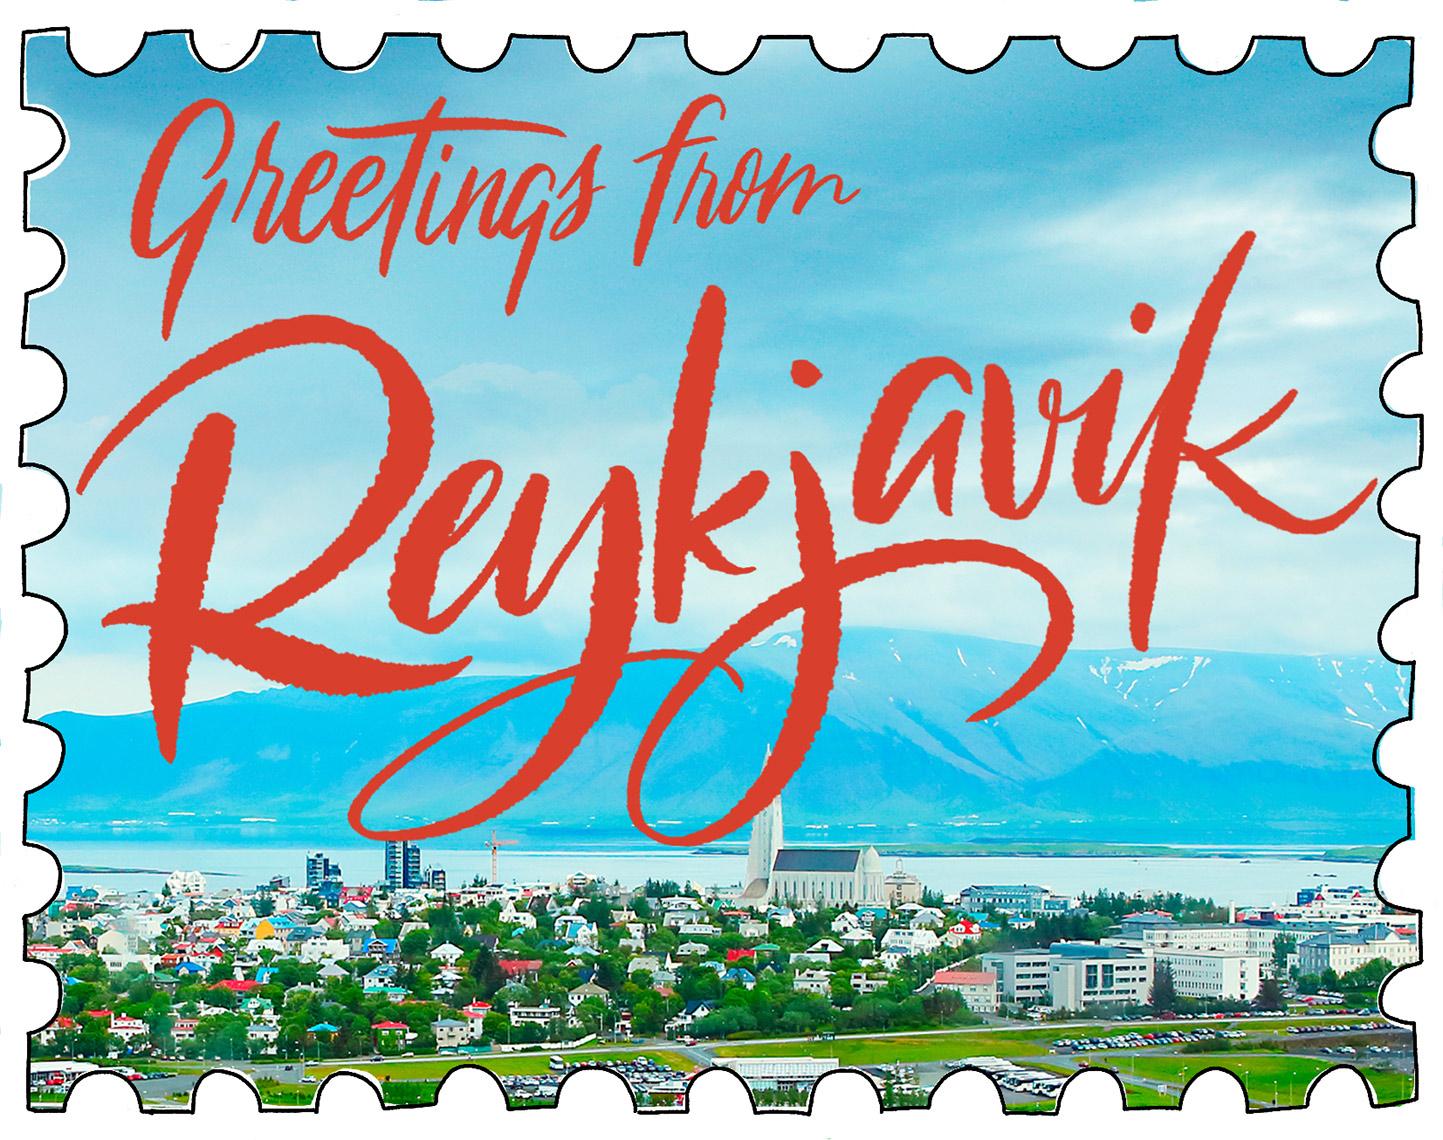 Angela_Reykjavik.jpg